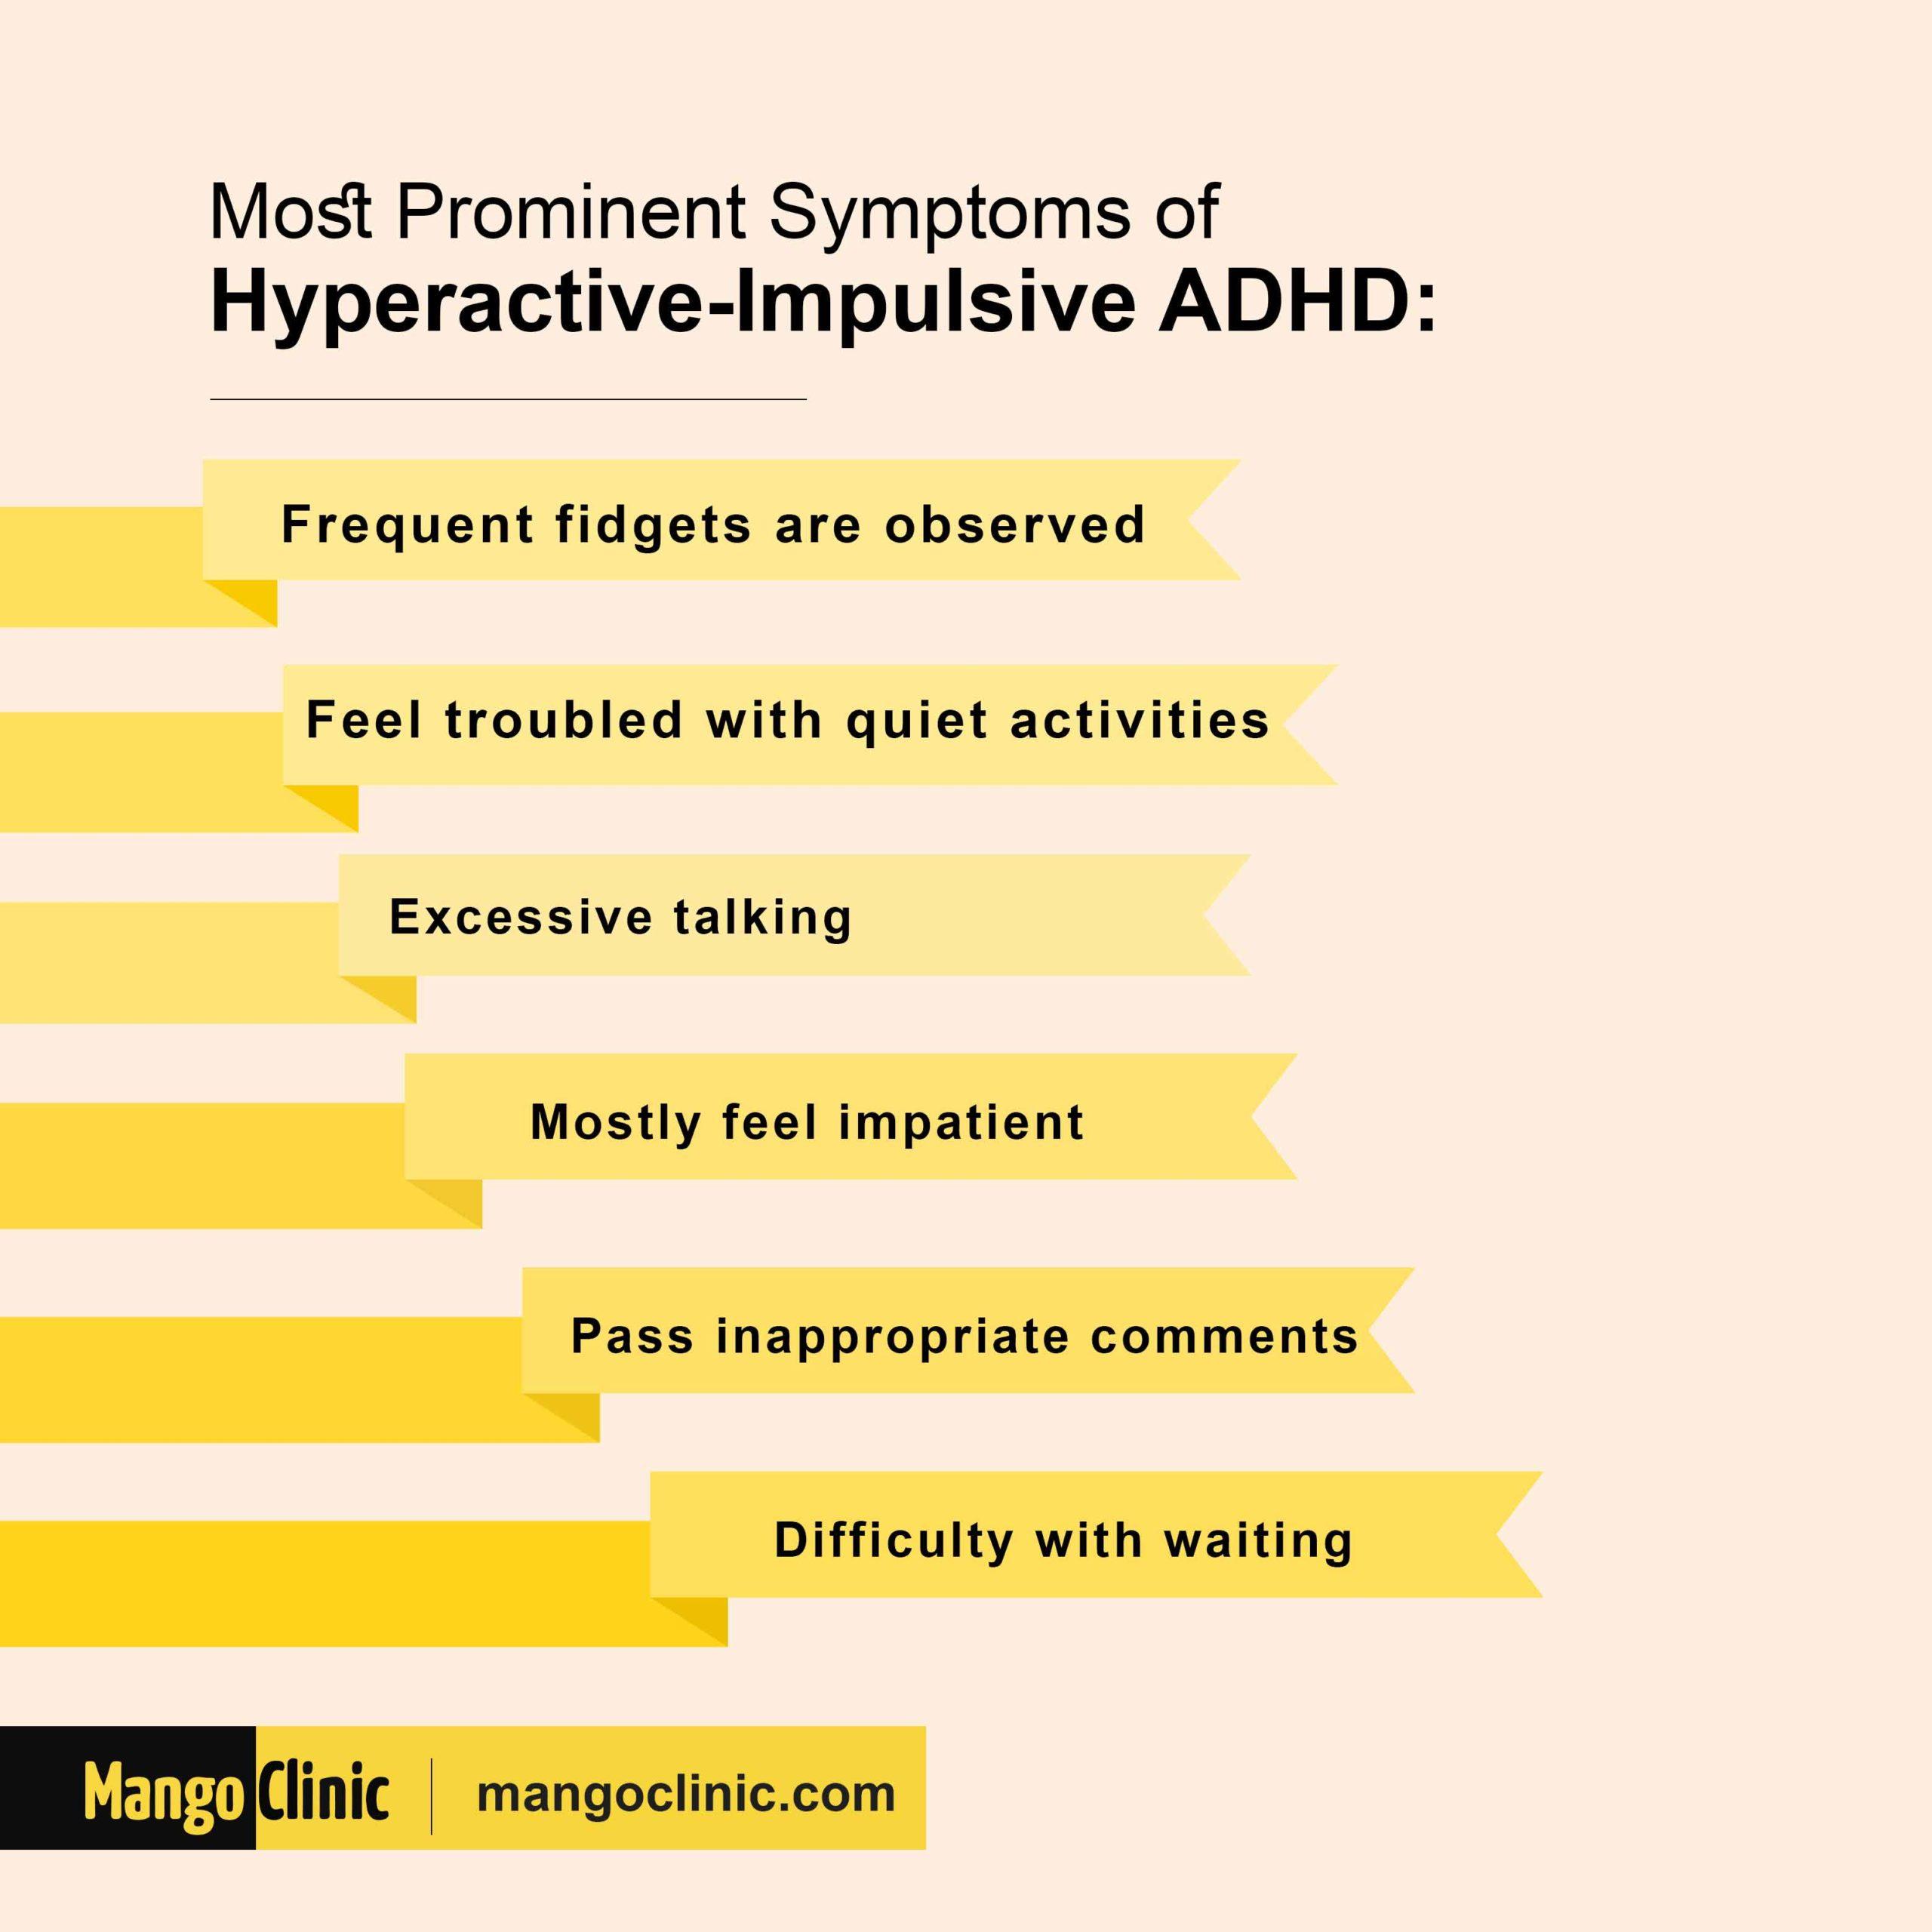 Hyperactive Impulsive ADHD